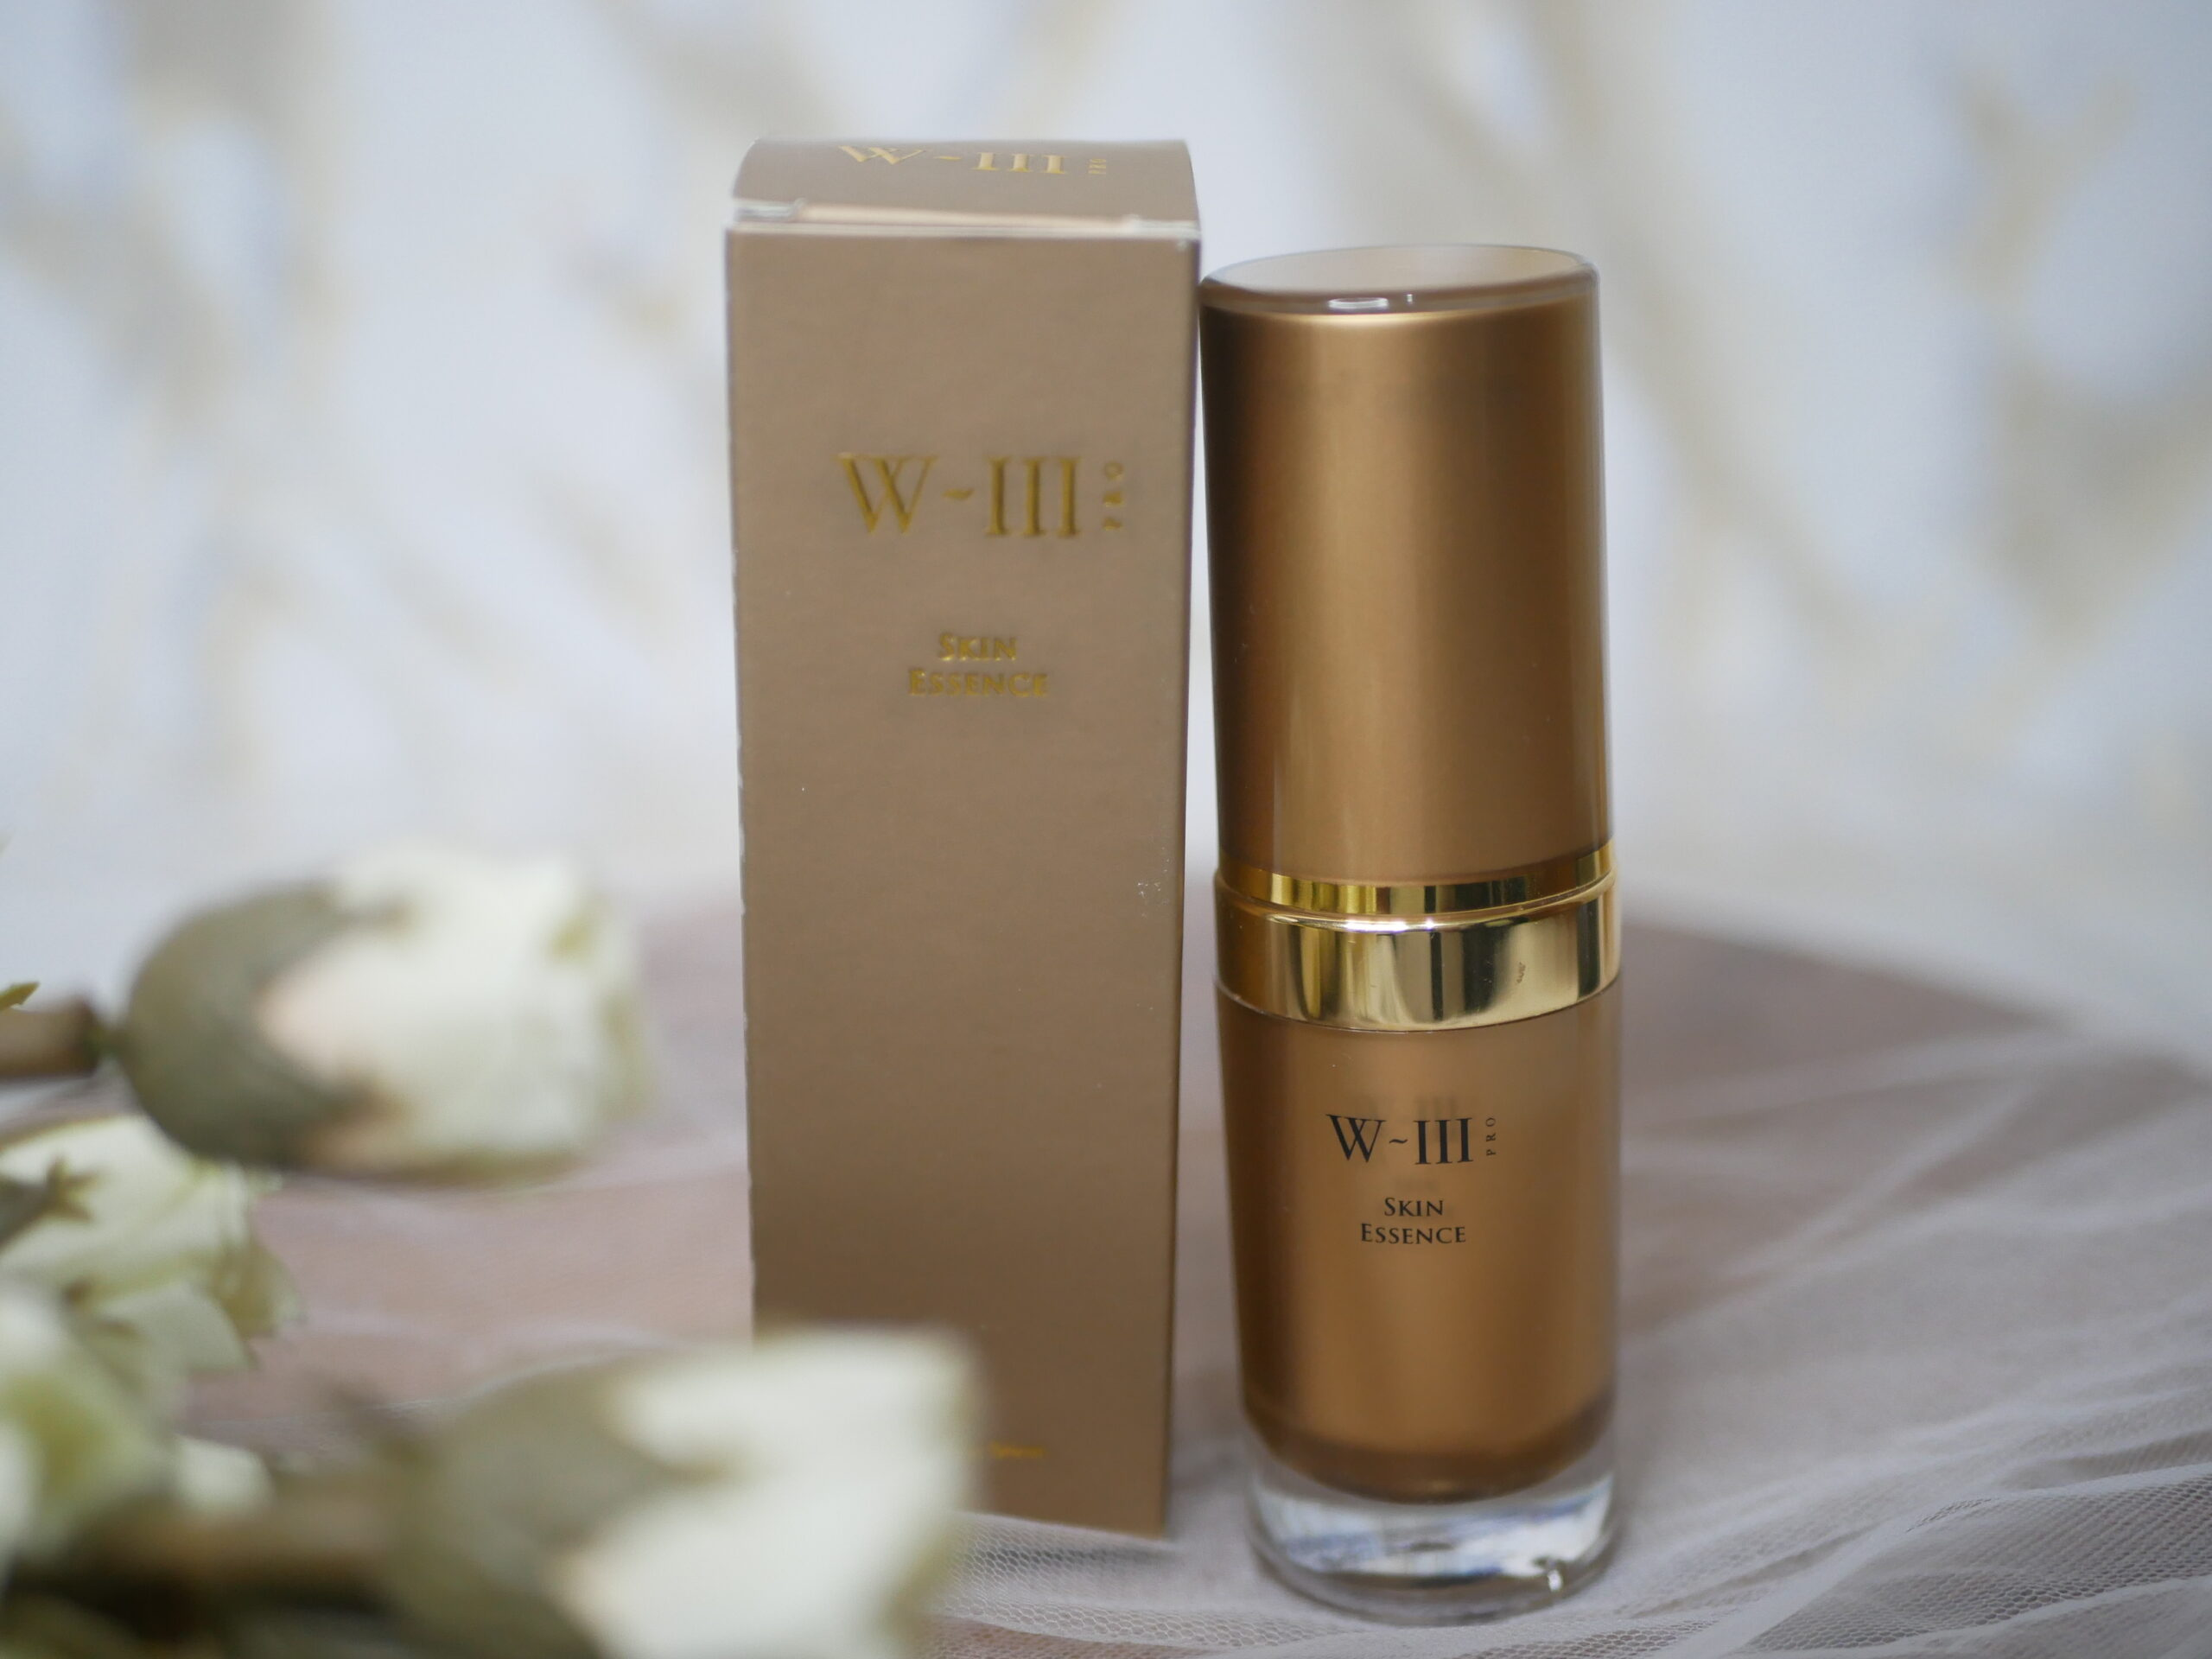 W~III Pro Skin Essence